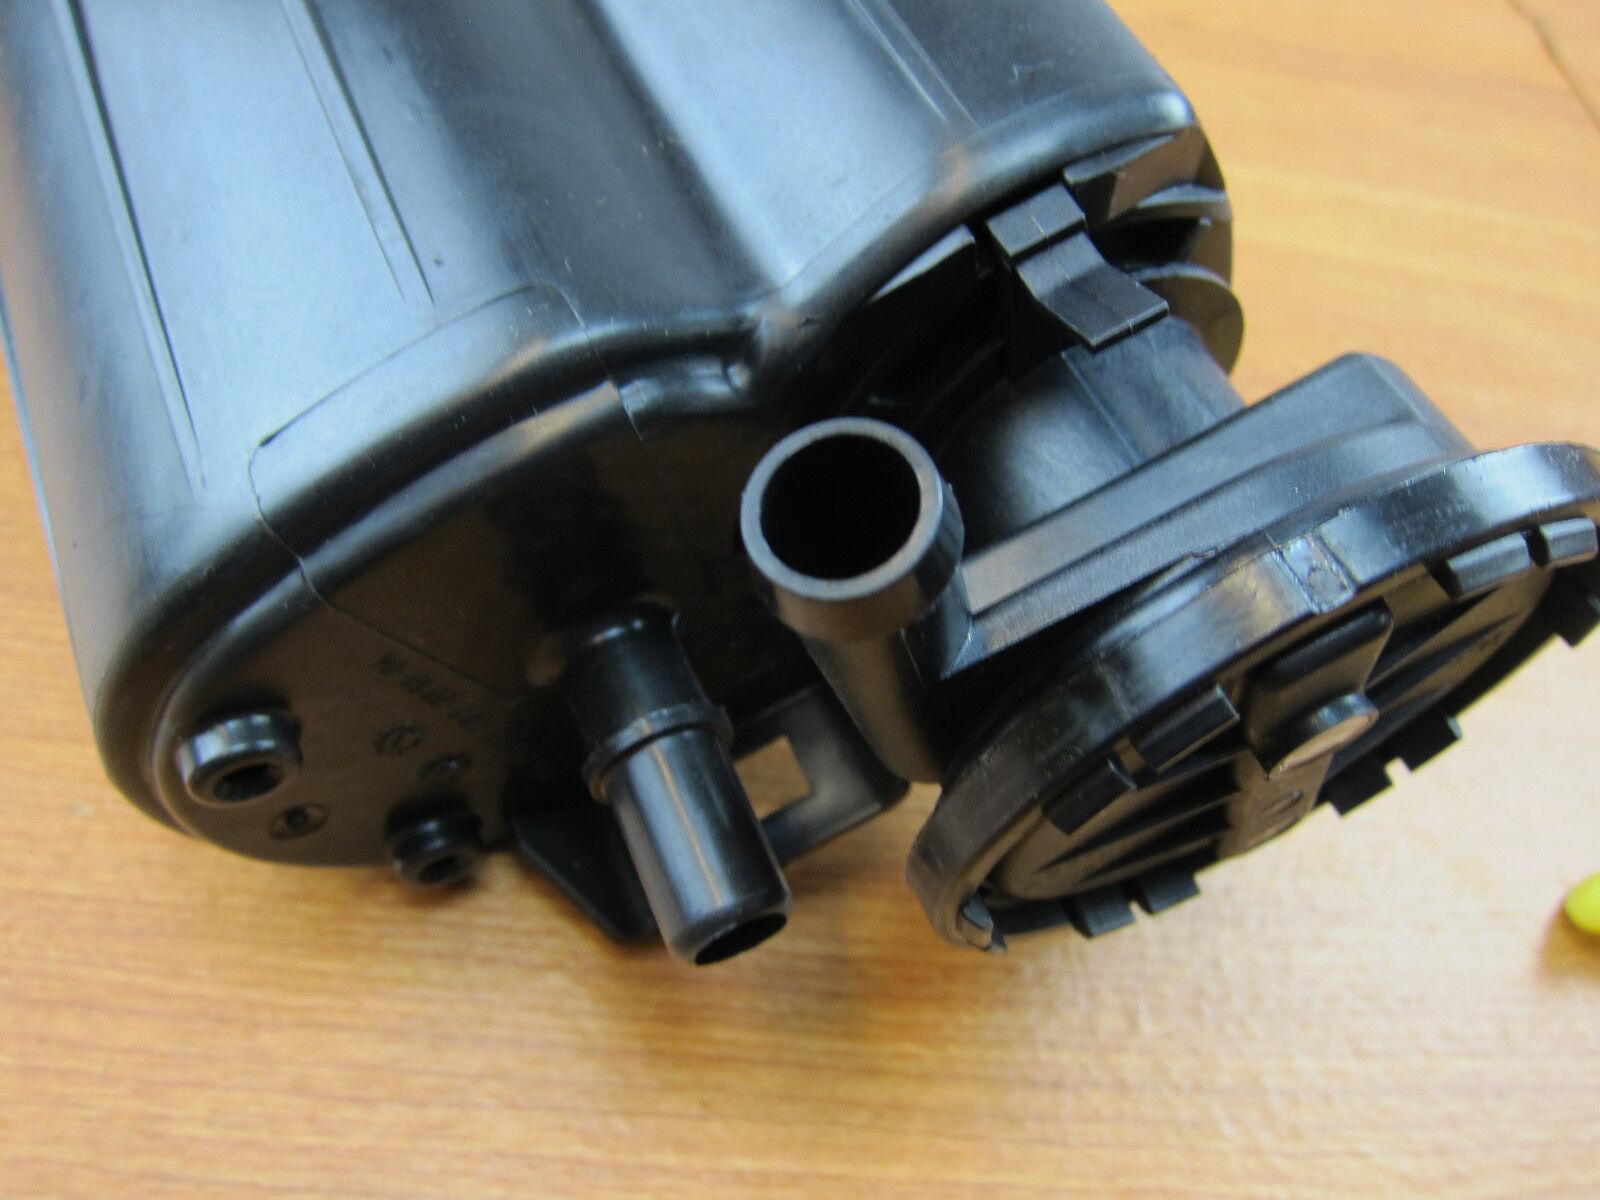 2002 2006 Chrysler Dodge Vapor Canister With Leak Detection Pump Fuel Evap 2003 Caravan Mopar Oem